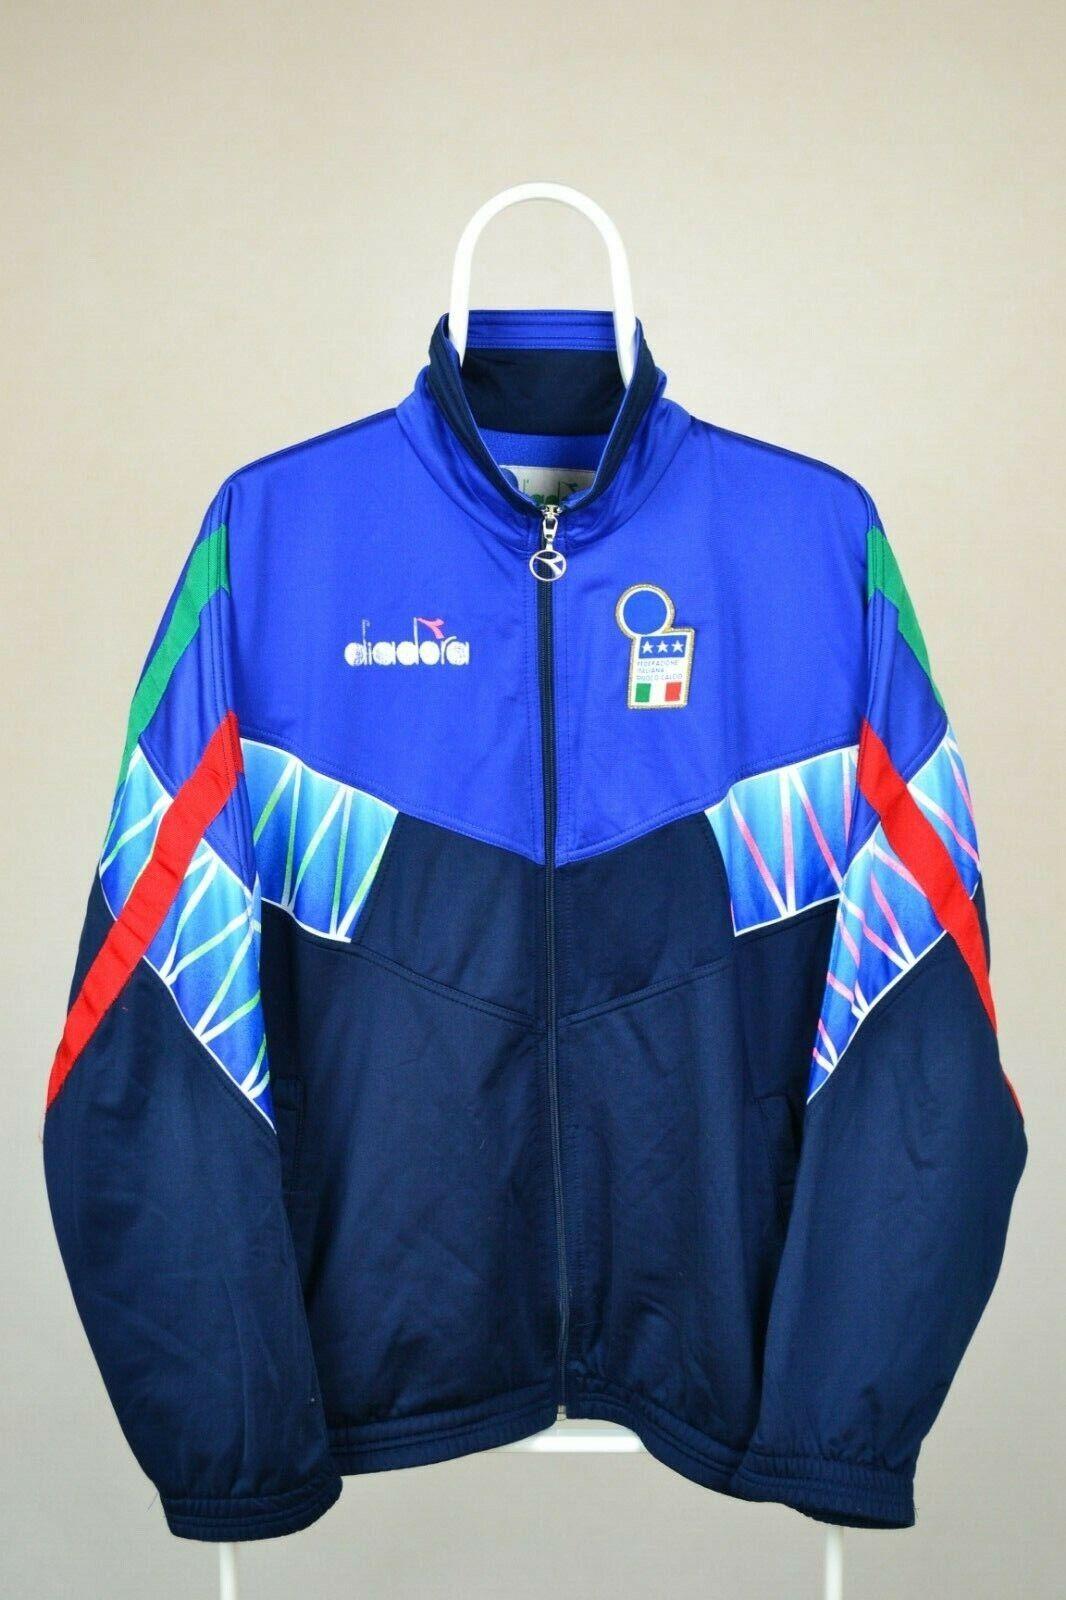 Italia Italia Diadora Vintage Fútbol Track de Superdry Chaqueta Traje Italia 90 era Baggio